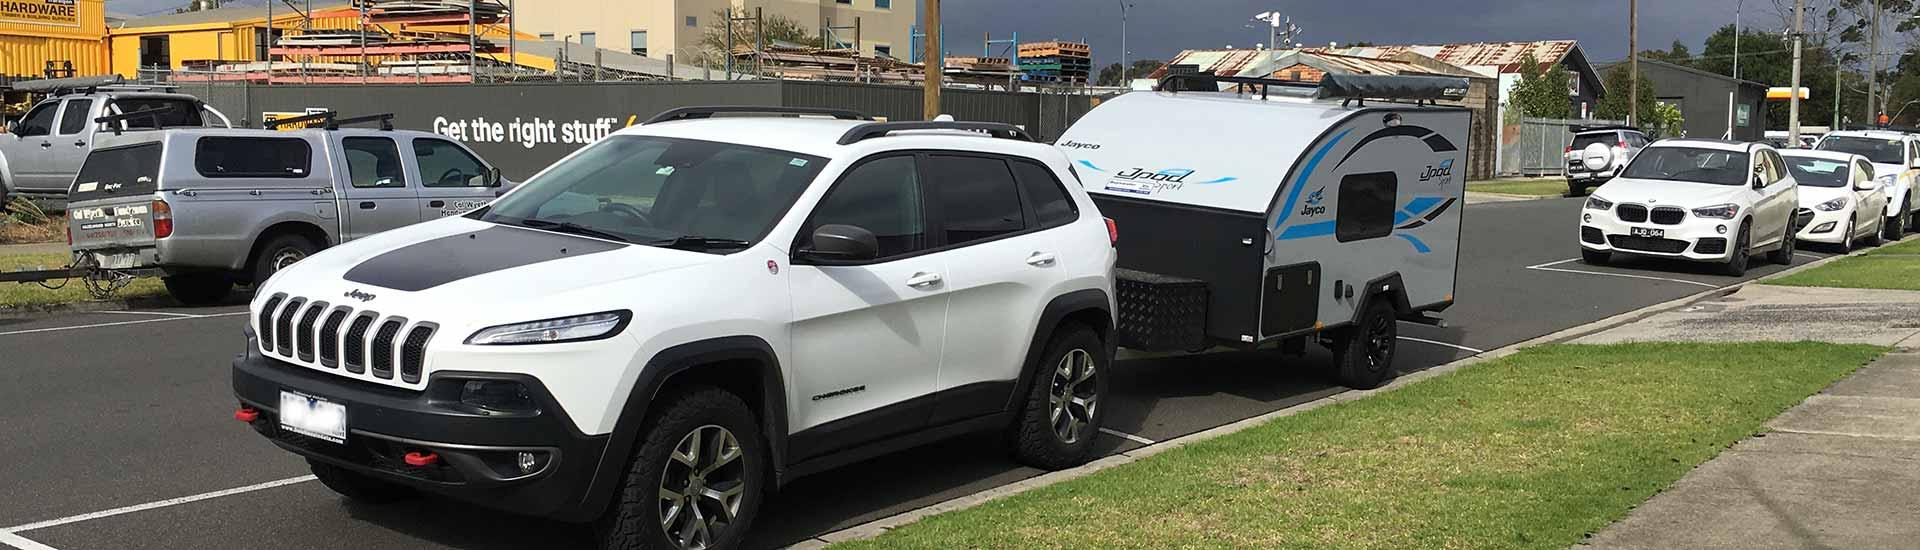 Jeep and Jayco Jpod parked at Traralgon